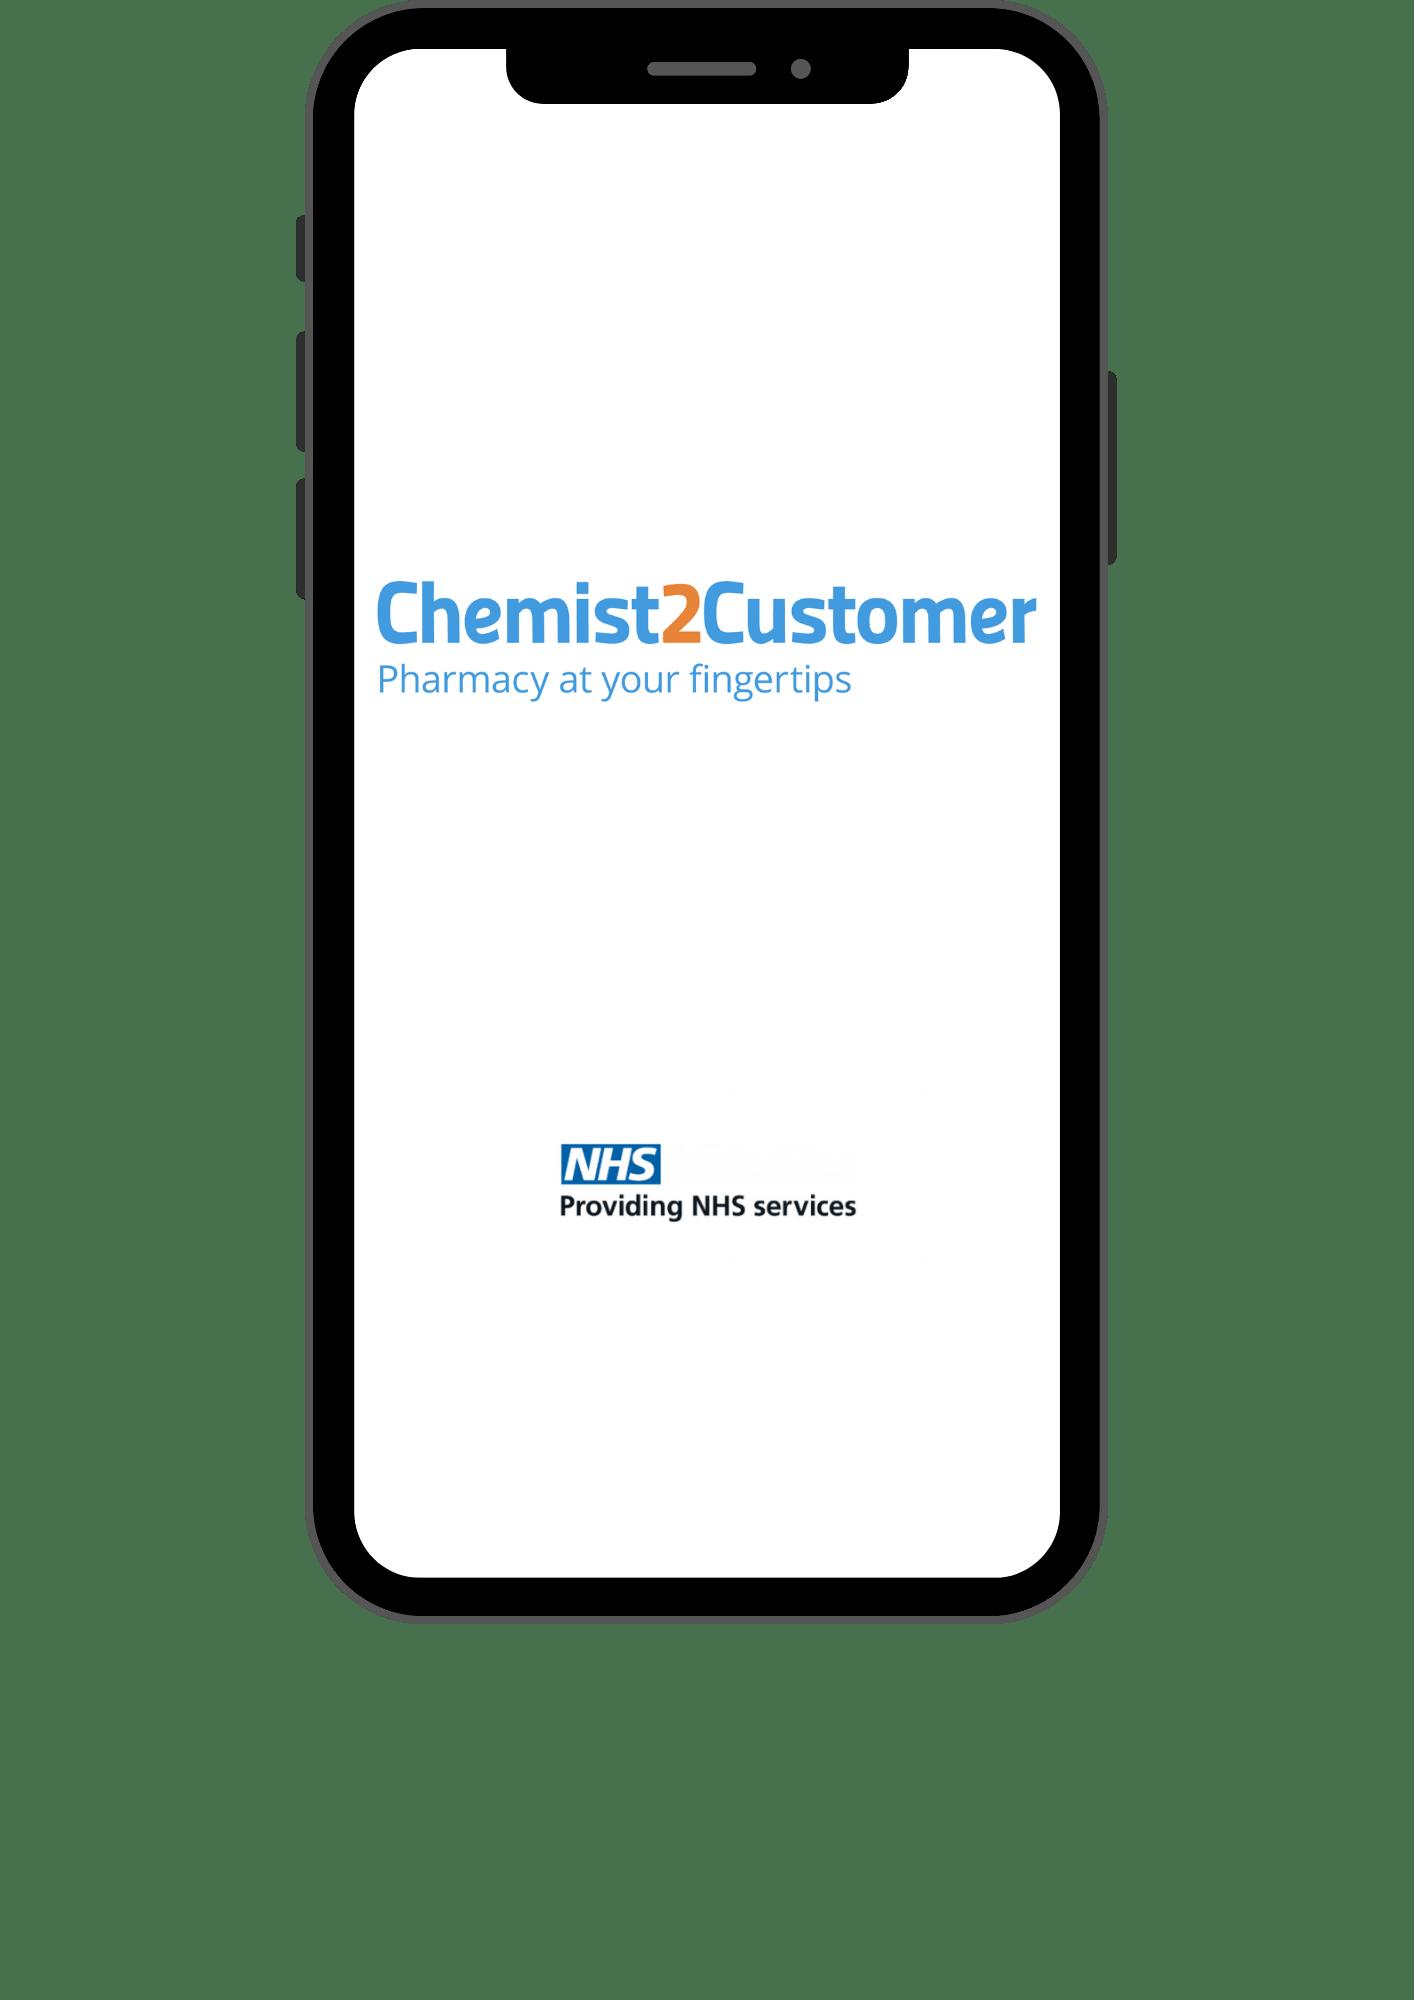 Chemist 2 Customer